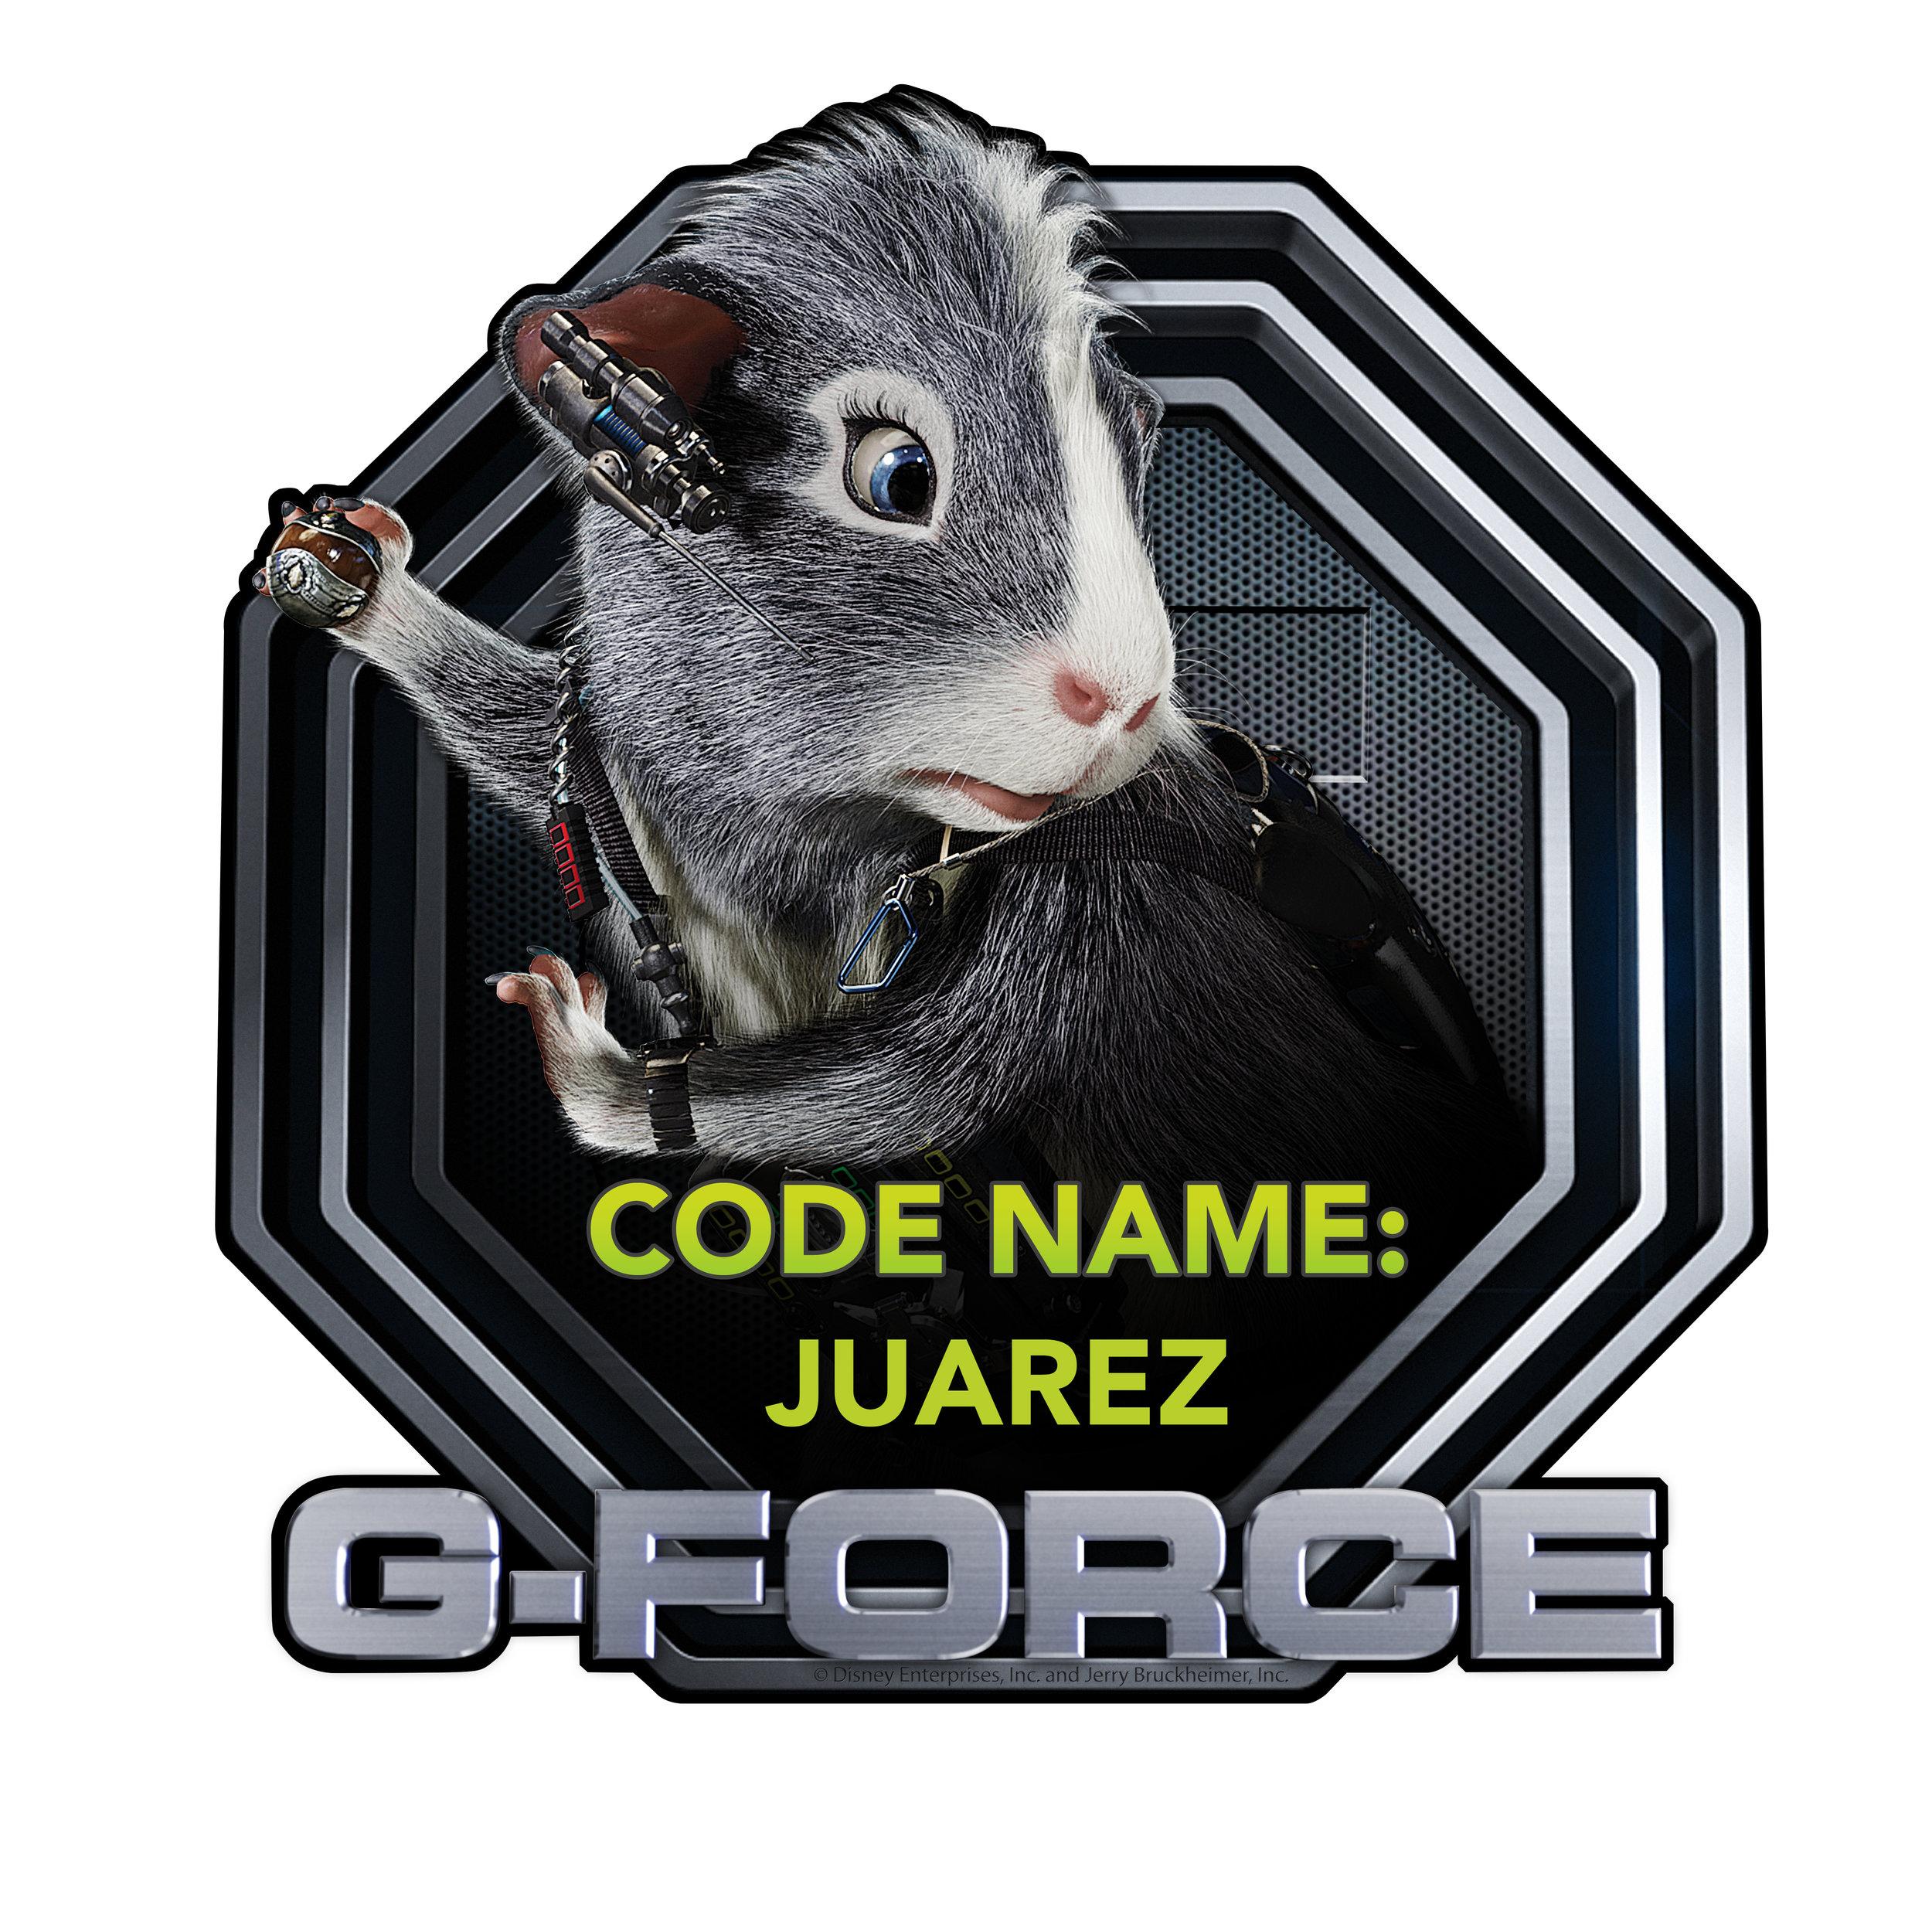 Gforce_Juarez.jpg